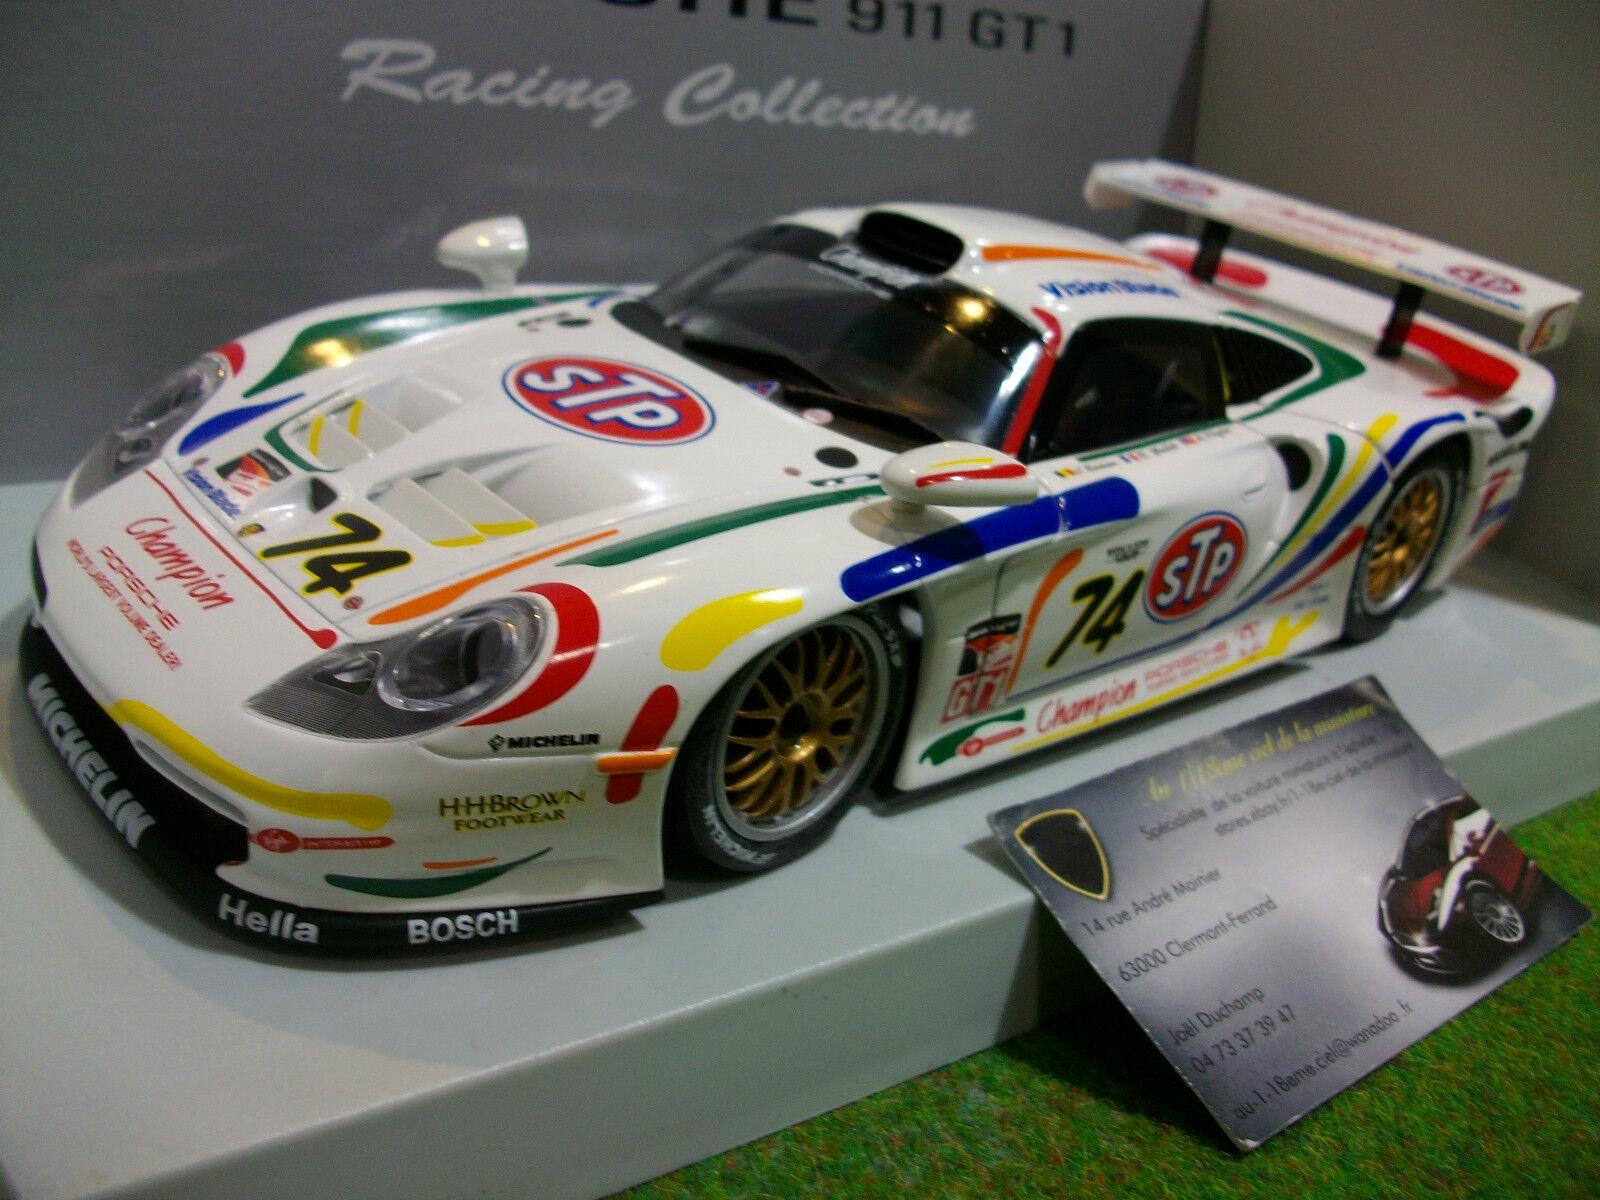 PORSCHE 911 GT1 1998 STP  74 BOUTSEN 1 18 UT Models 39810 voiture miniature